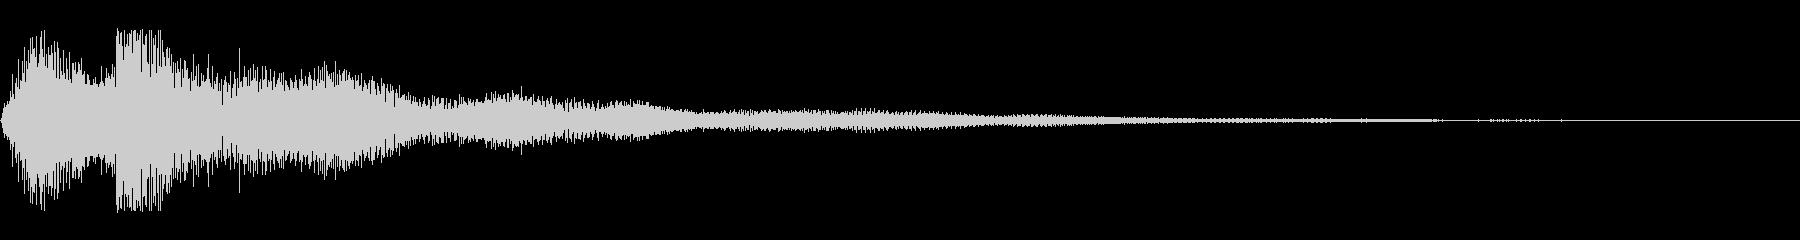 【GAME系】連鎖/パズル/4コンボの未再生の波形